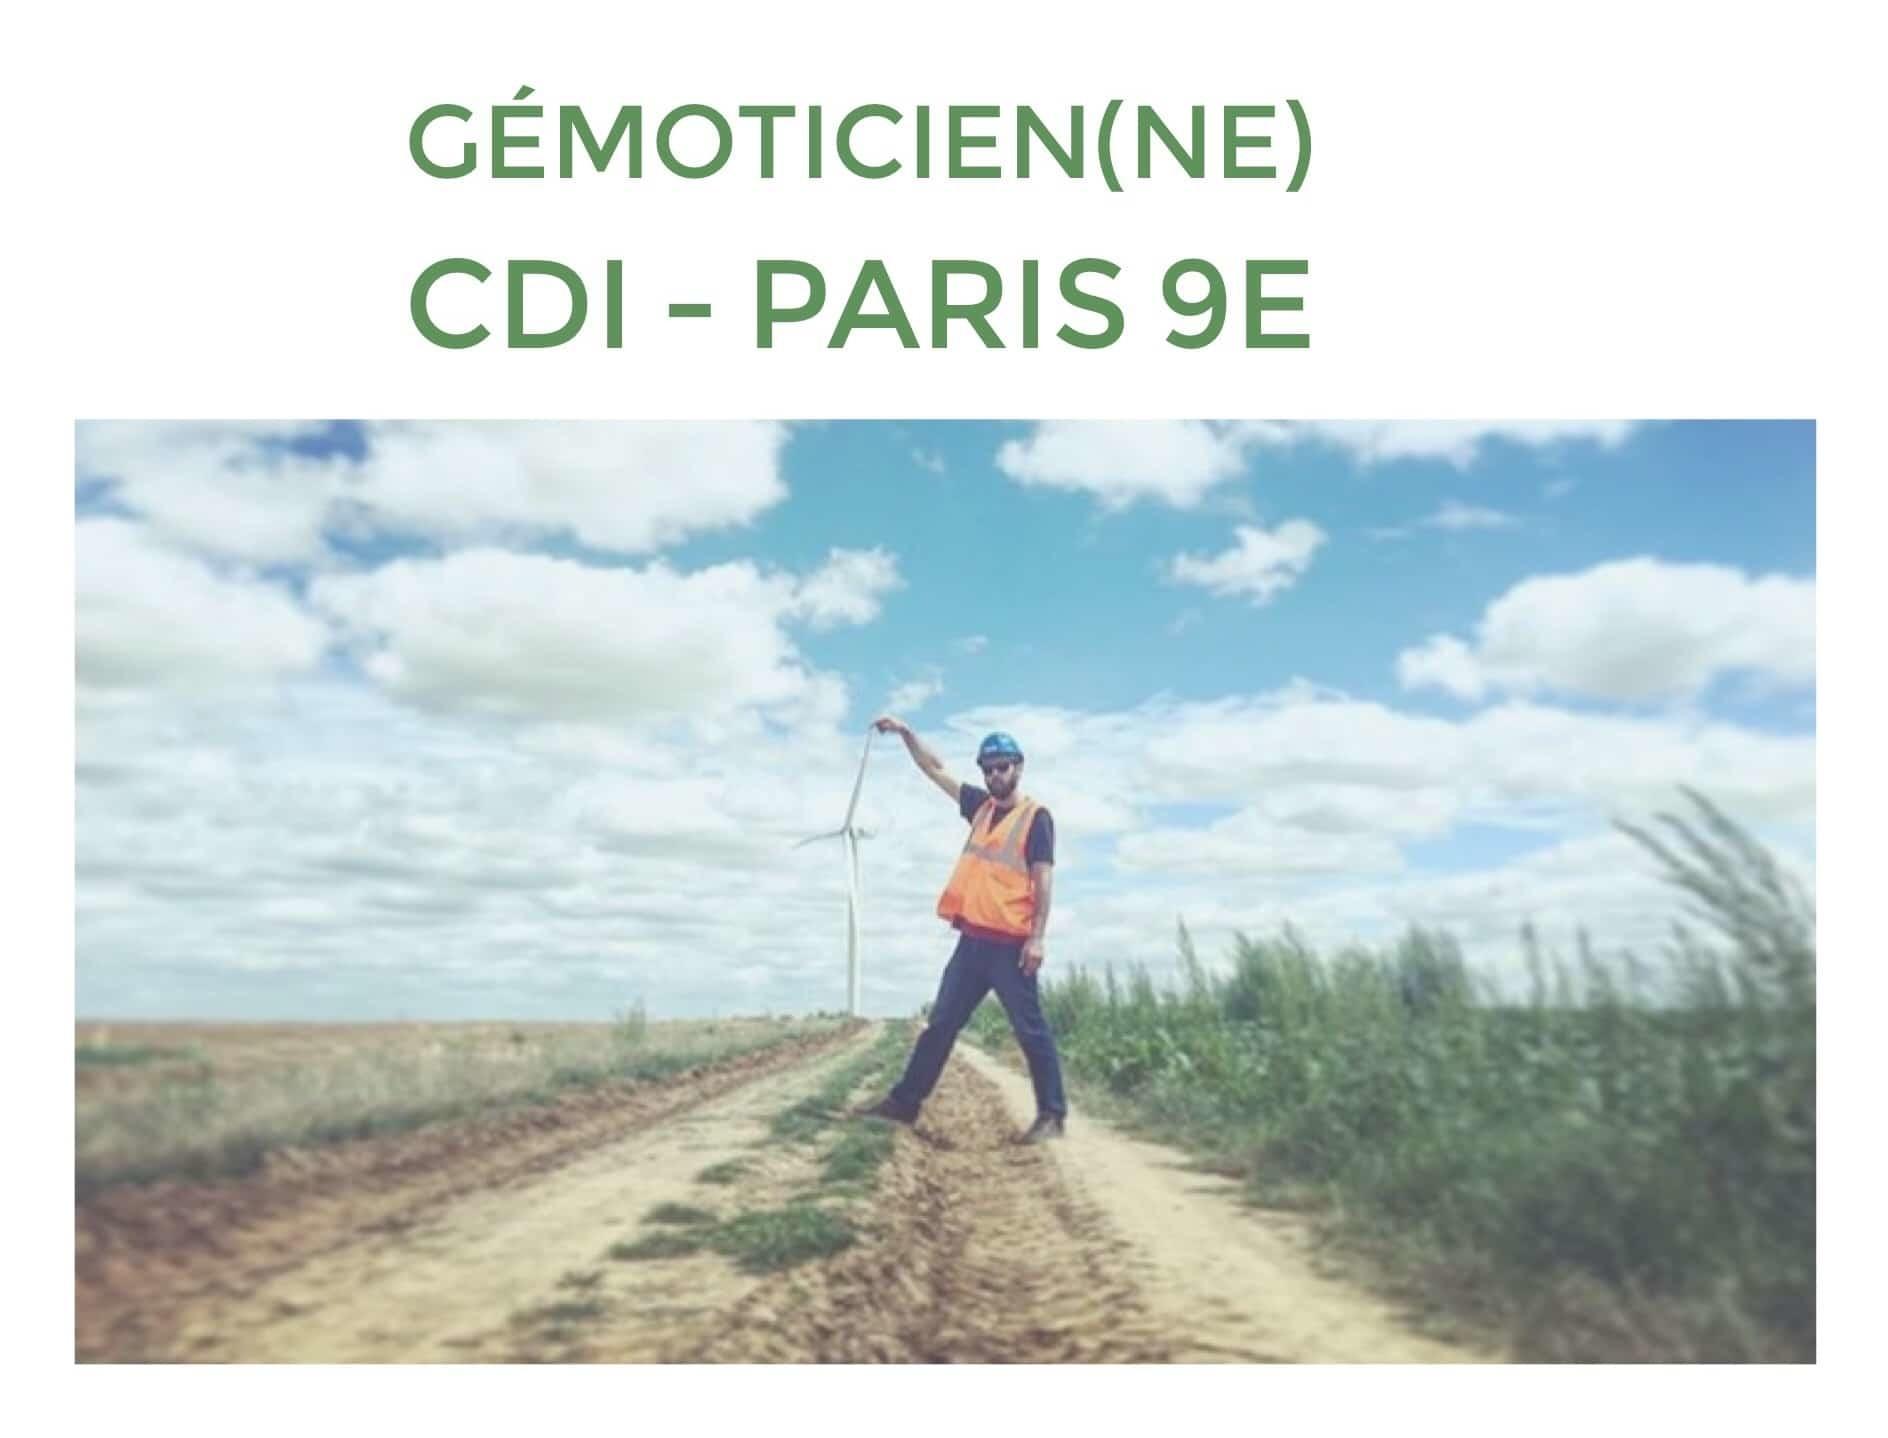 [JOB] CDI – GEOMATICIEN (NE) H/F (CDI) – Paris 9ème